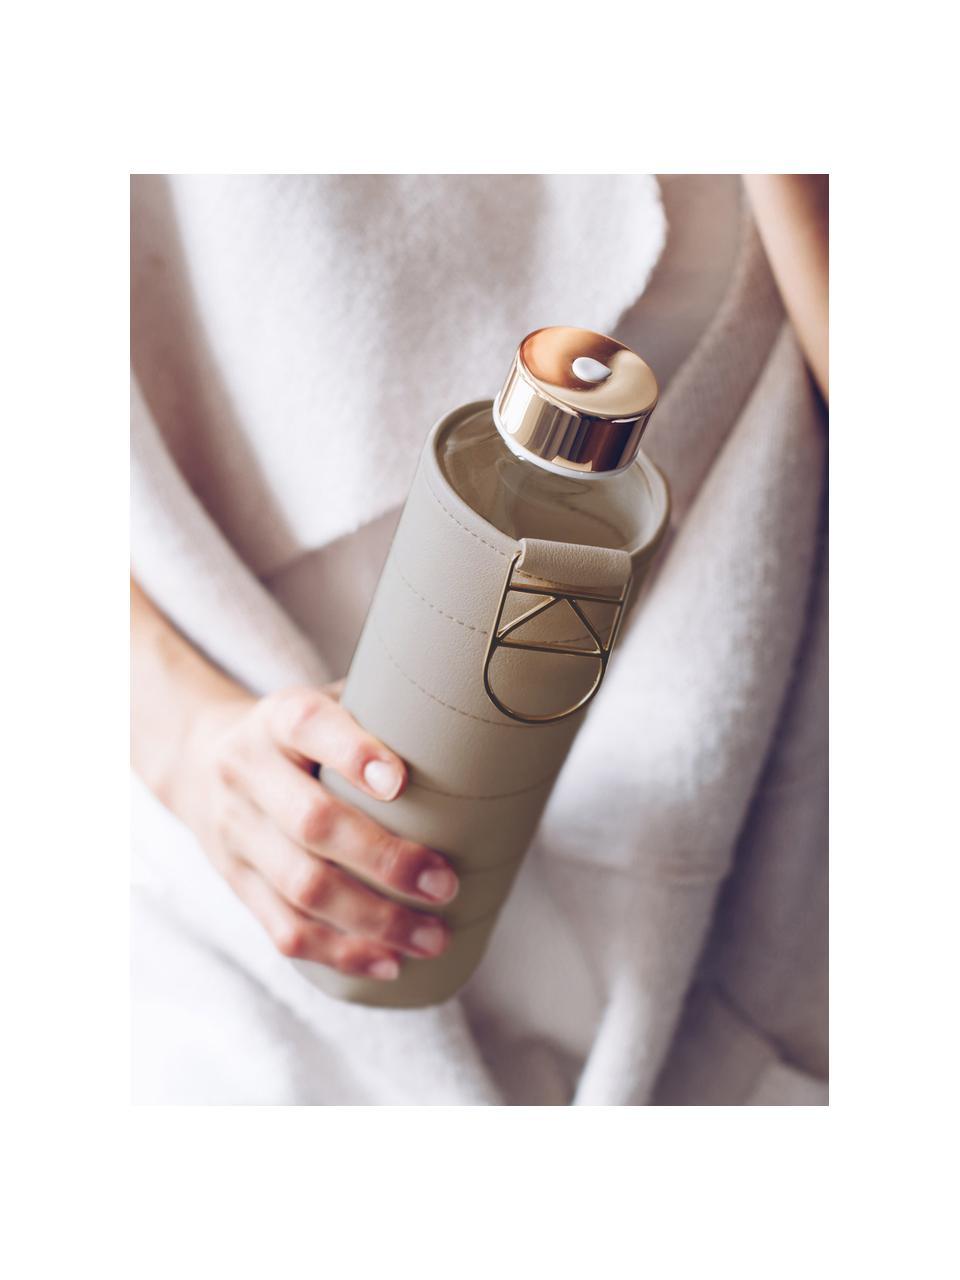 Trinkflasche Mismatch, Flasche: Borosilikatglas, Deckel: Edelstahl, Tritan, Siliko, Bezug: Kunstleder, Beige, Transparent, Ø 8 x H 26 cm